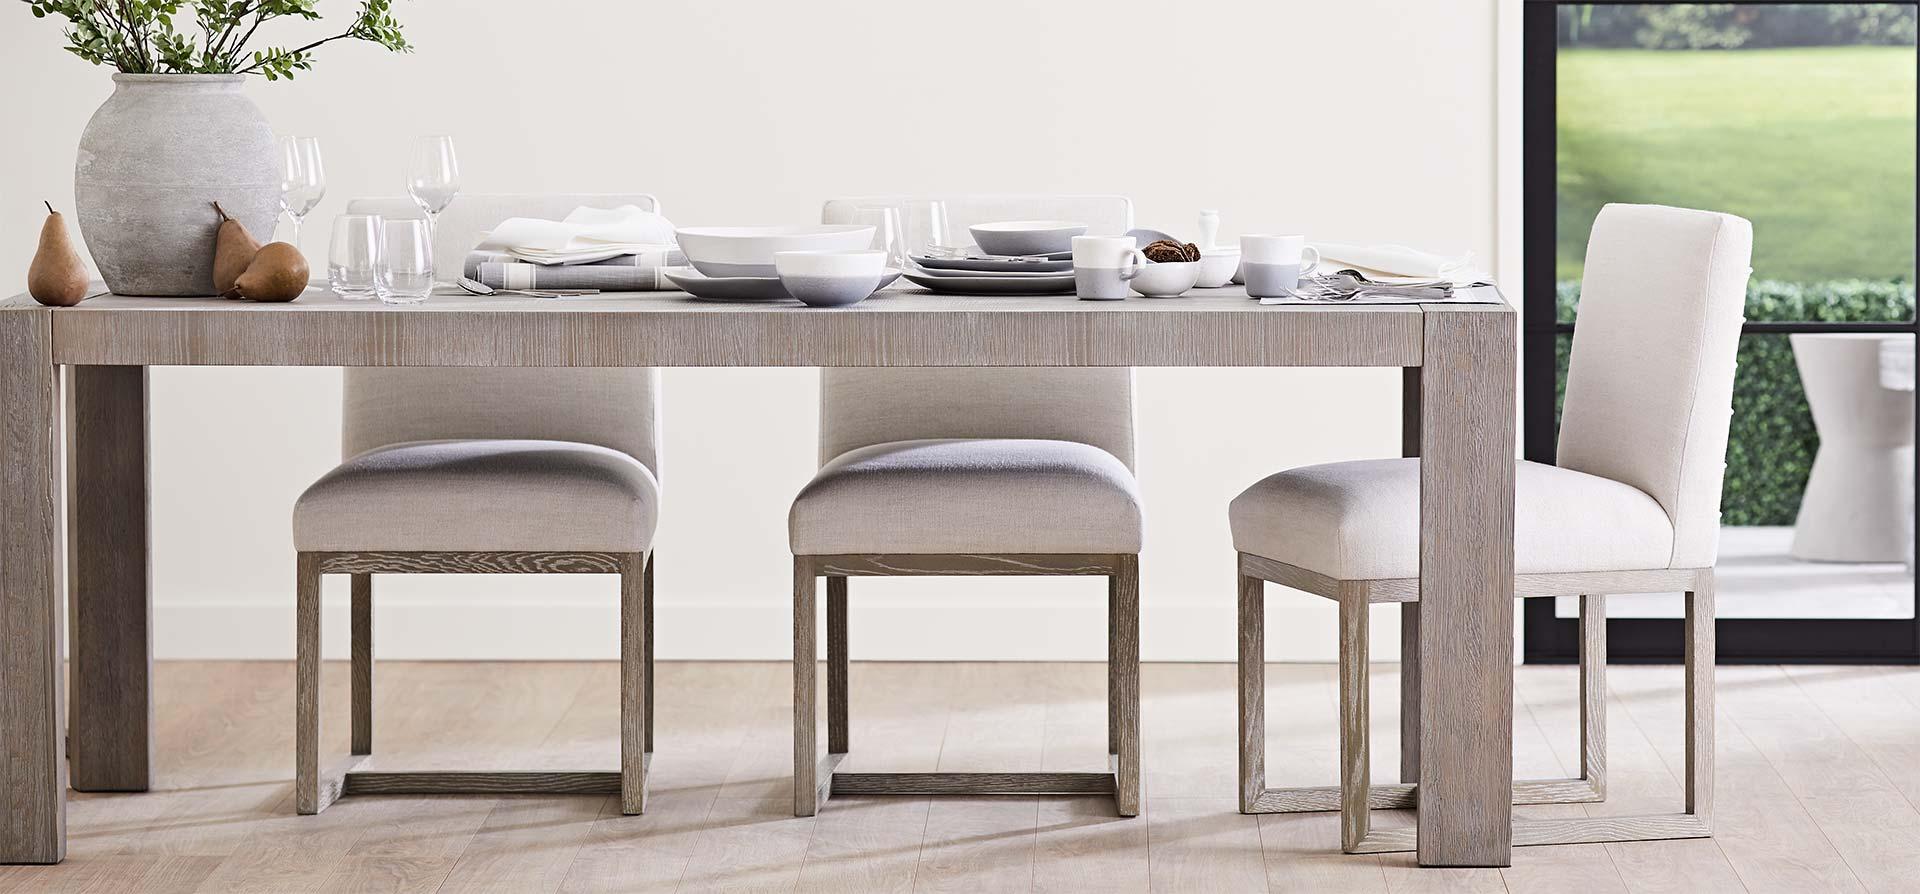 GlucksteinHome | Dining Tables